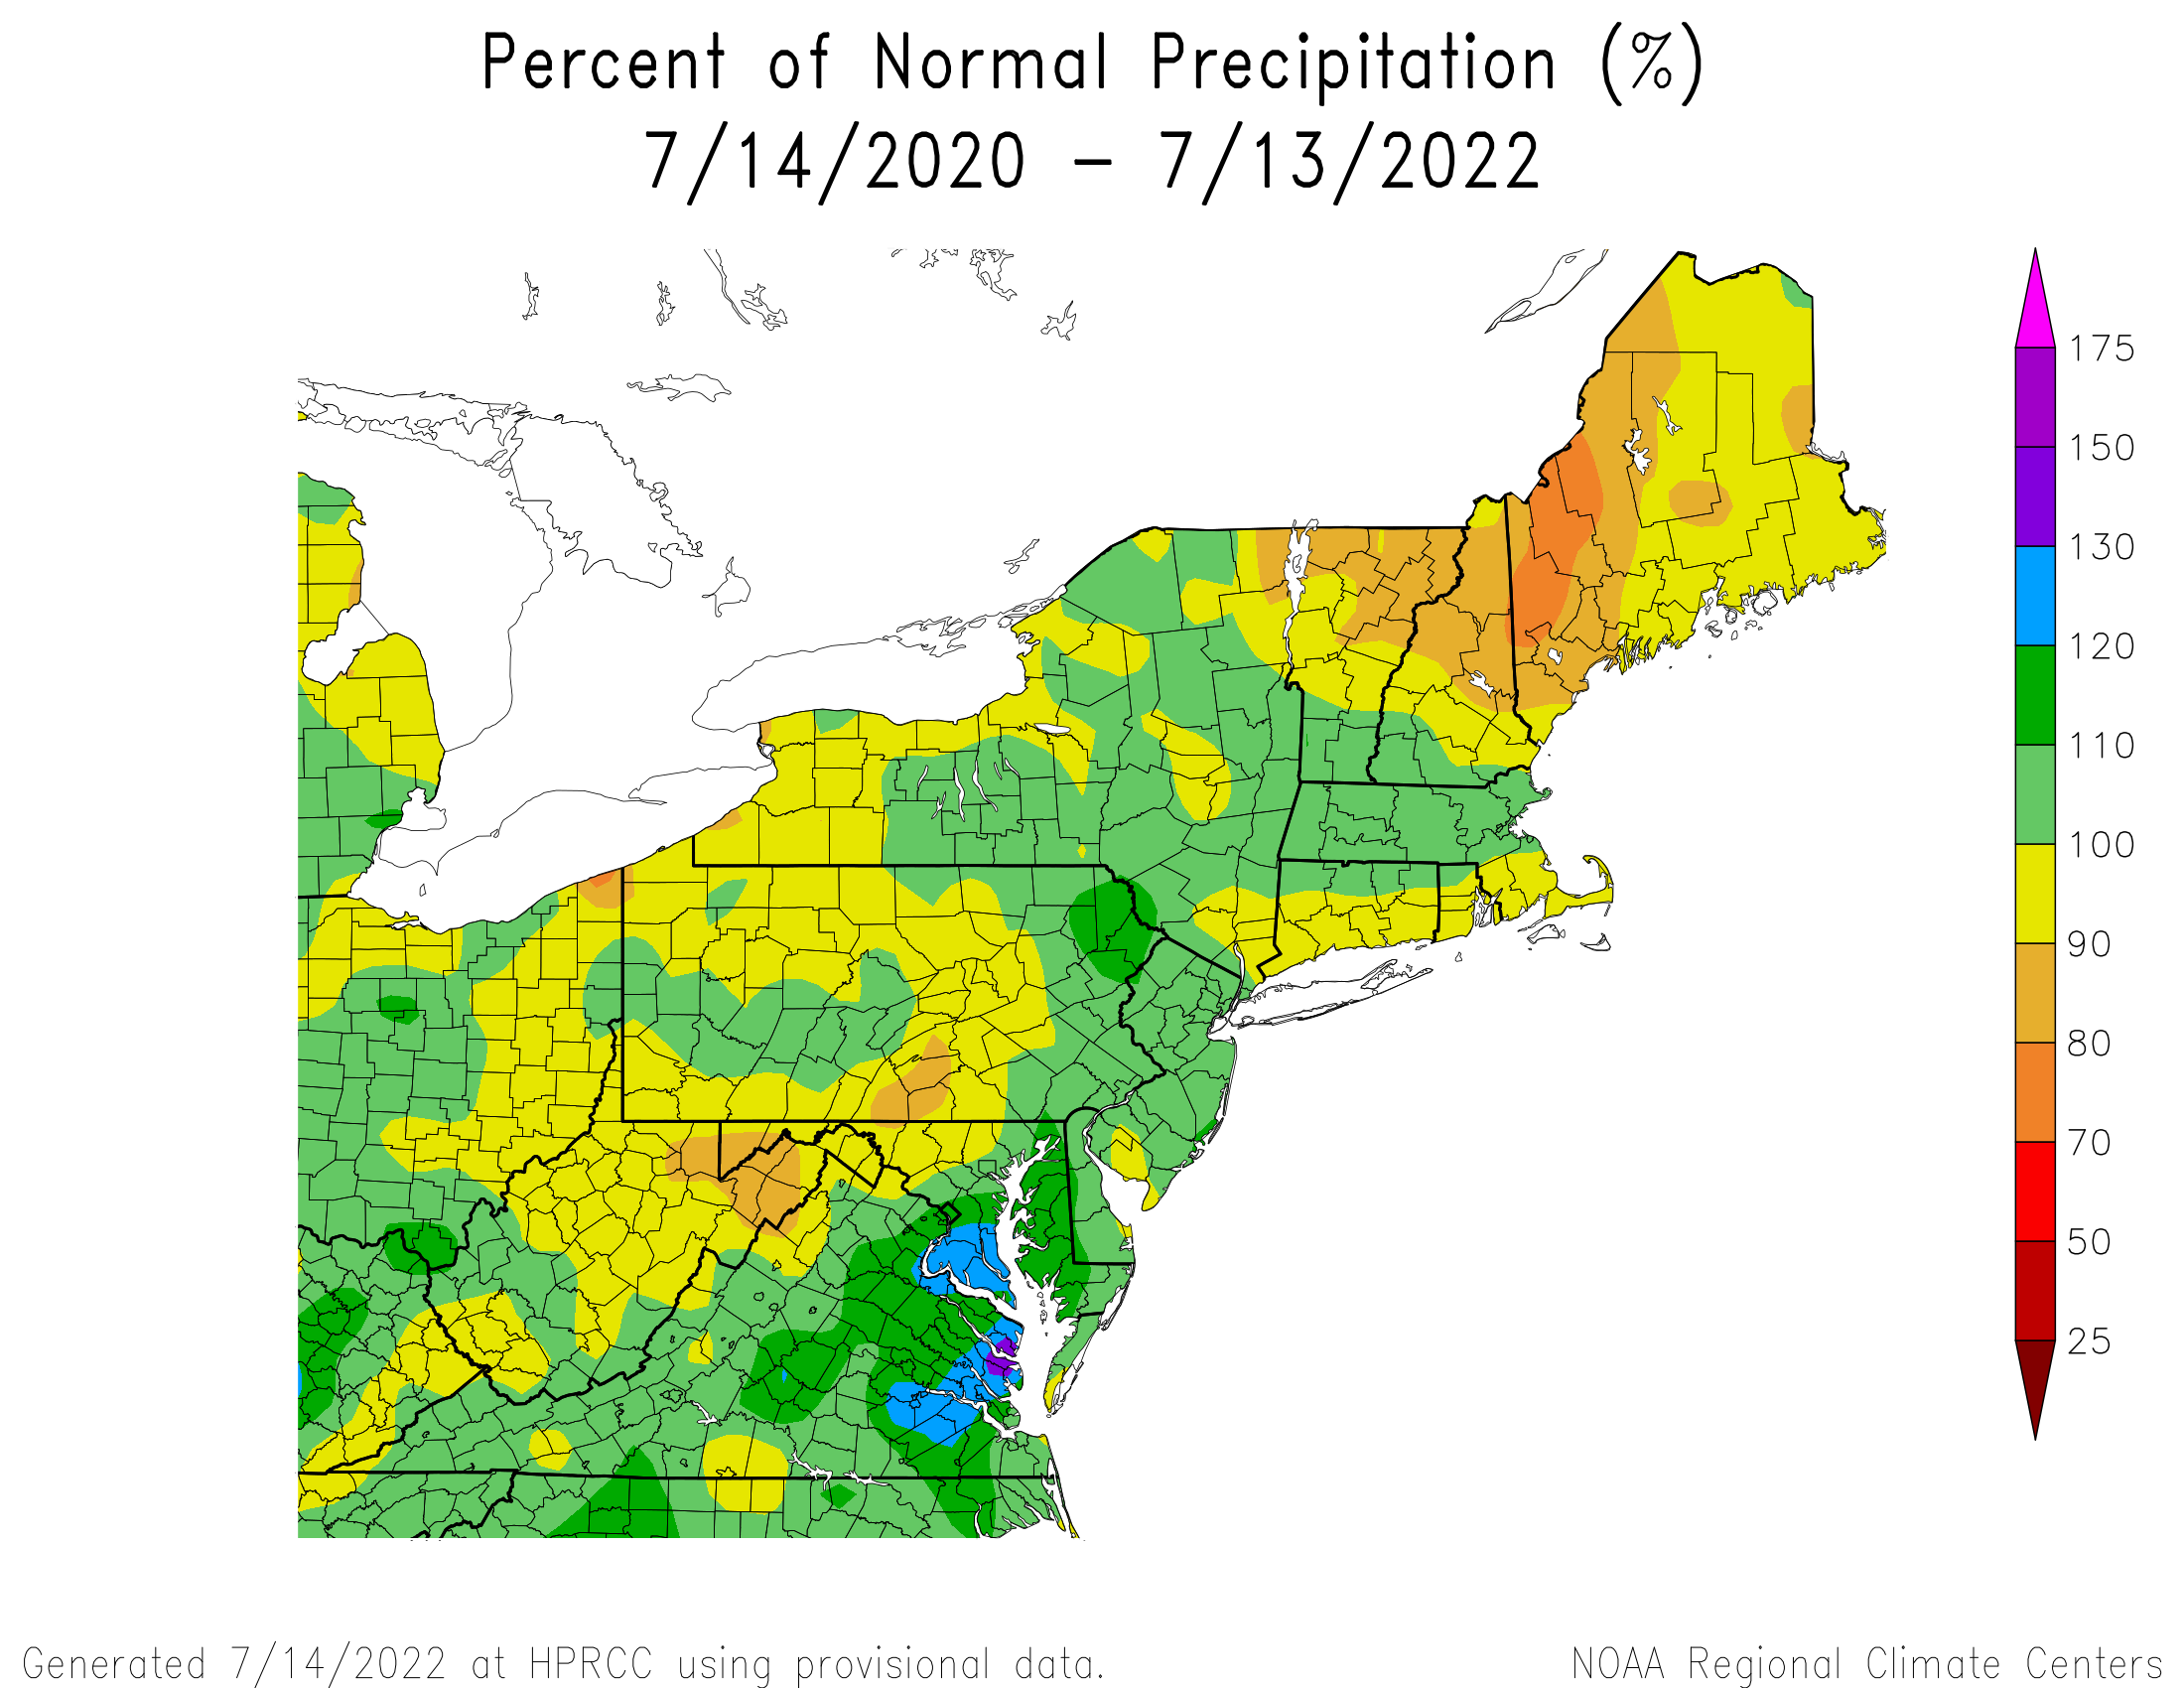 24Month Precipitation - Percentage of Normal